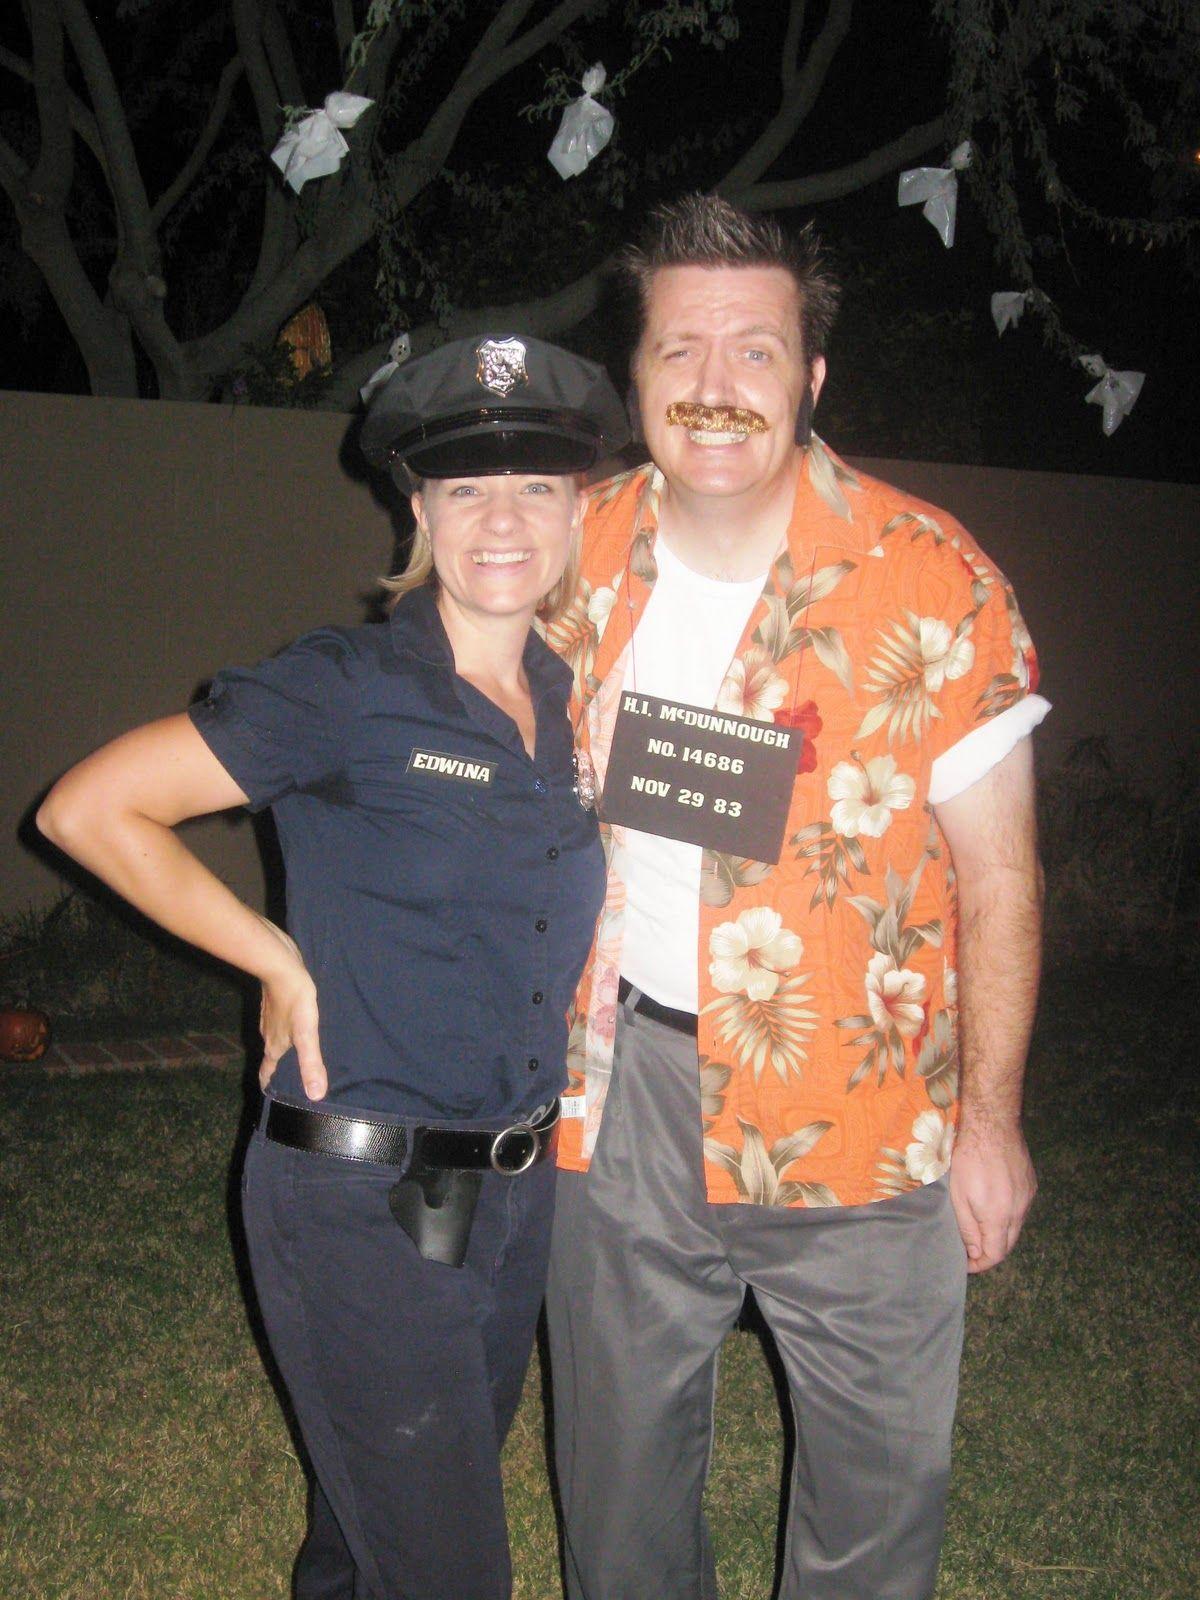 raising arizona halloween costume - Google Search | Halloween ...